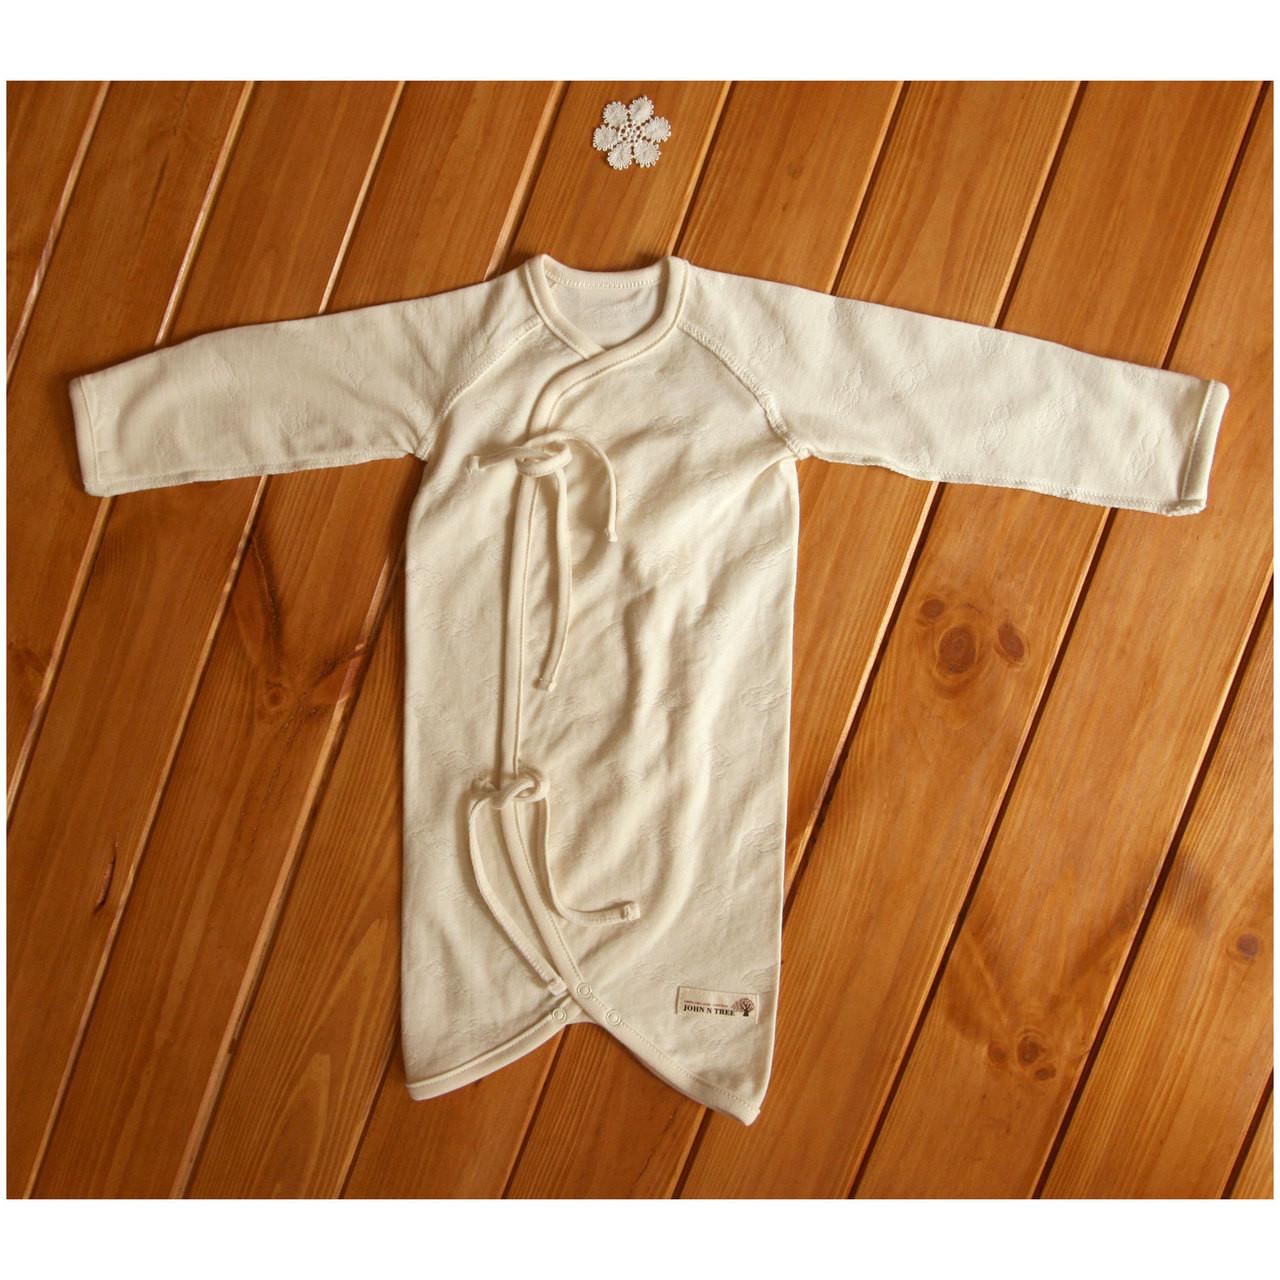 953a247b5 Button Baby Kimono Gown (S-Jacquard Cream Beige ) - JOHN N TREE